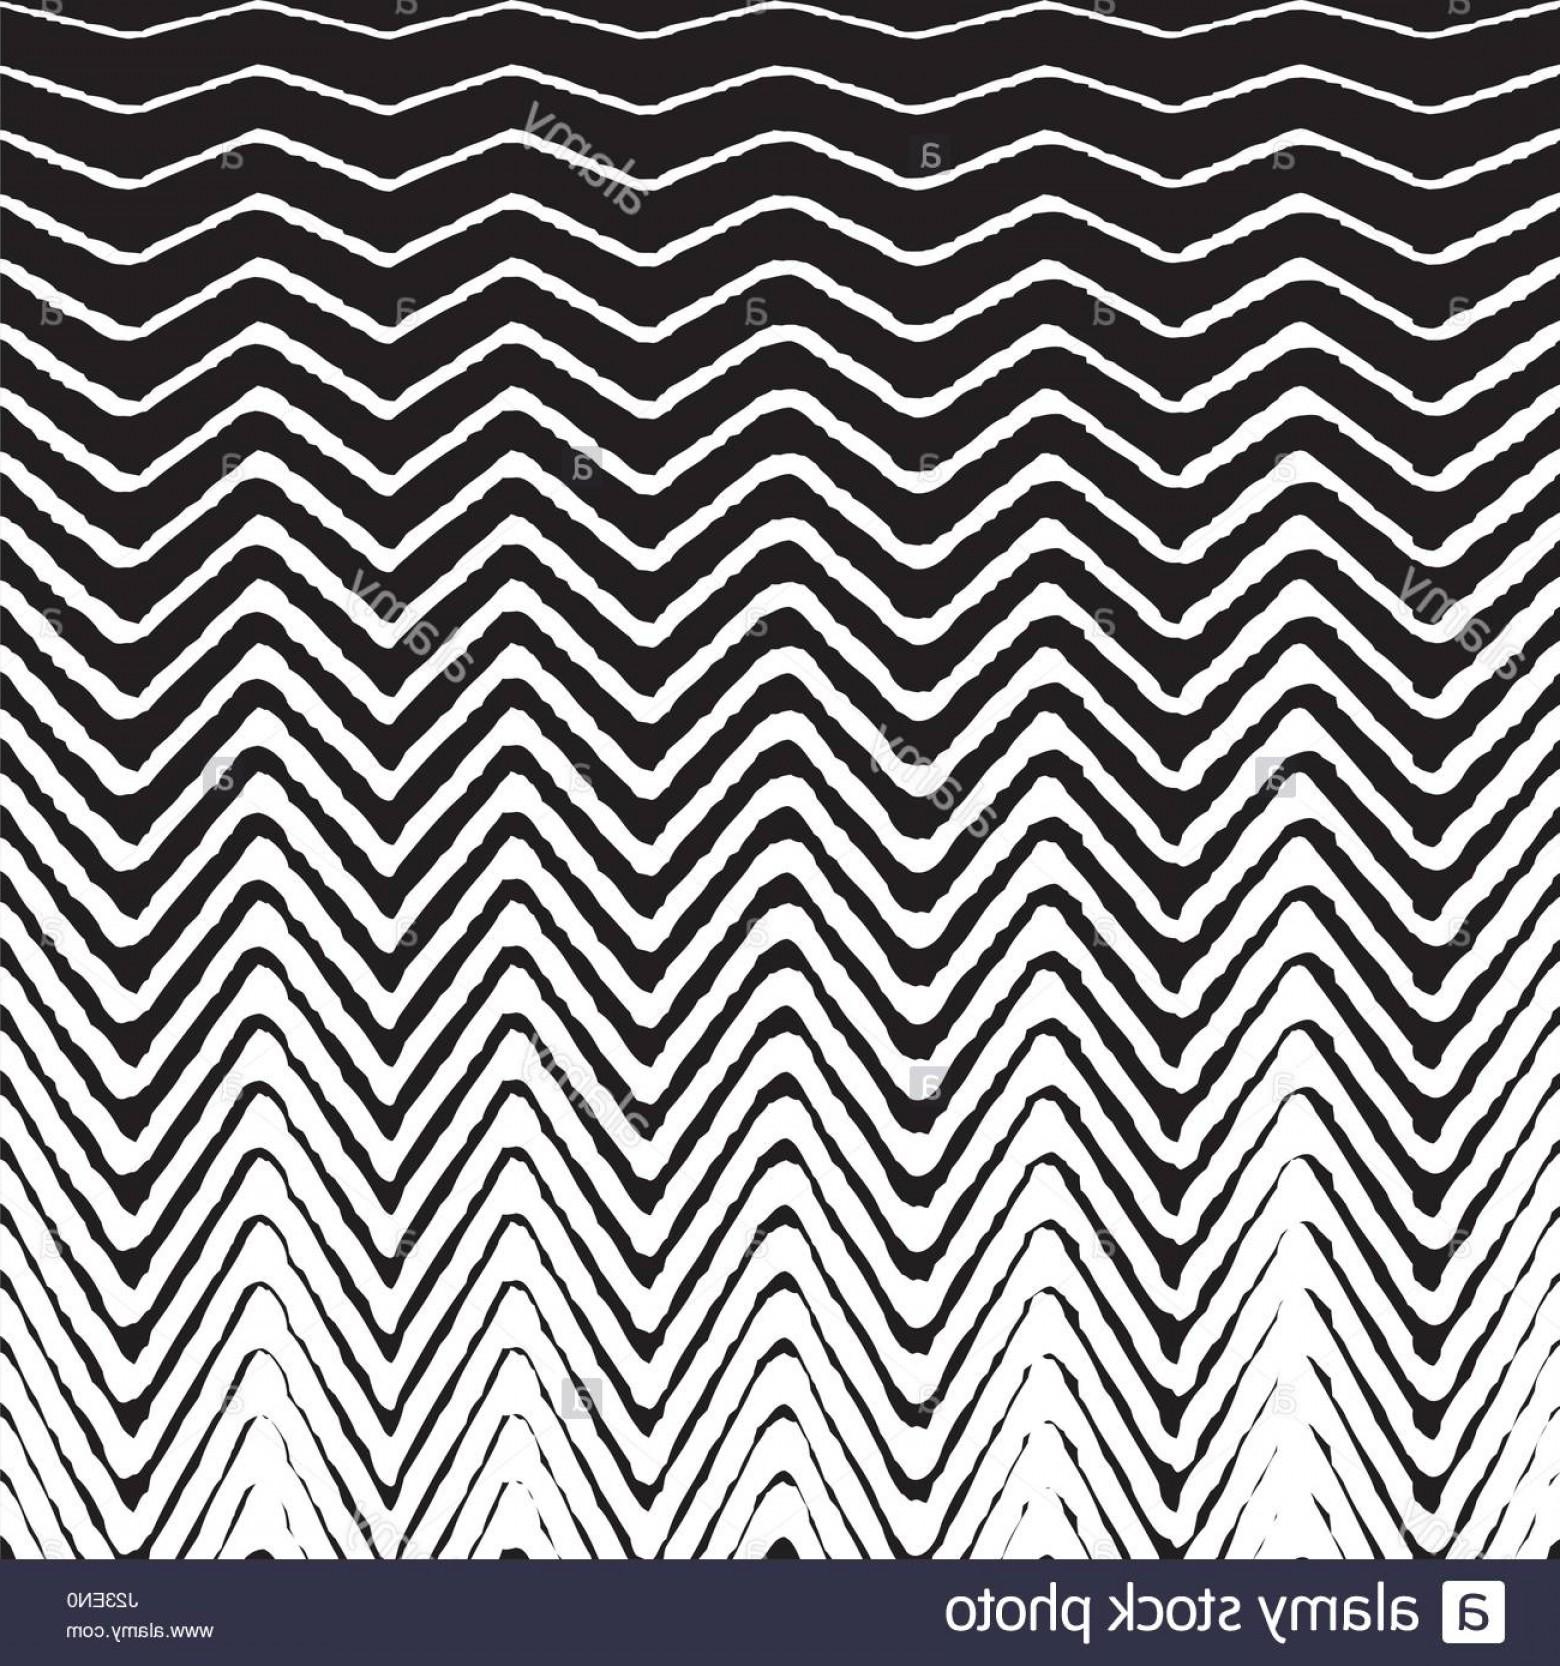 1560x1666 Stock Photo Halftone Zig Zag Pattern Background Vector Zigzag